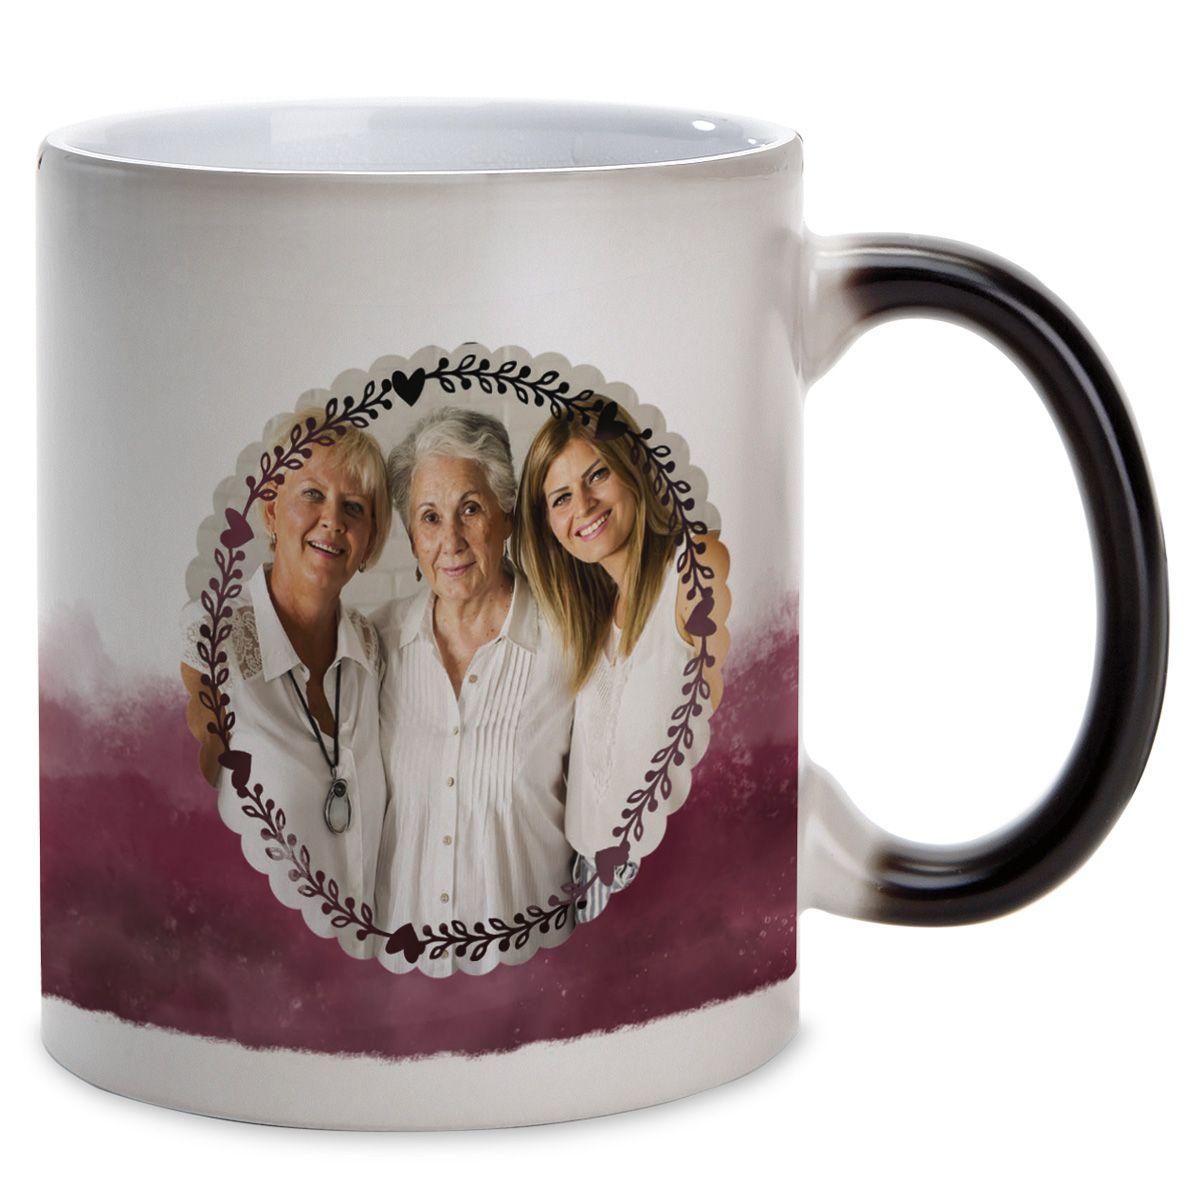 Watercolor Personalized Photo Mug